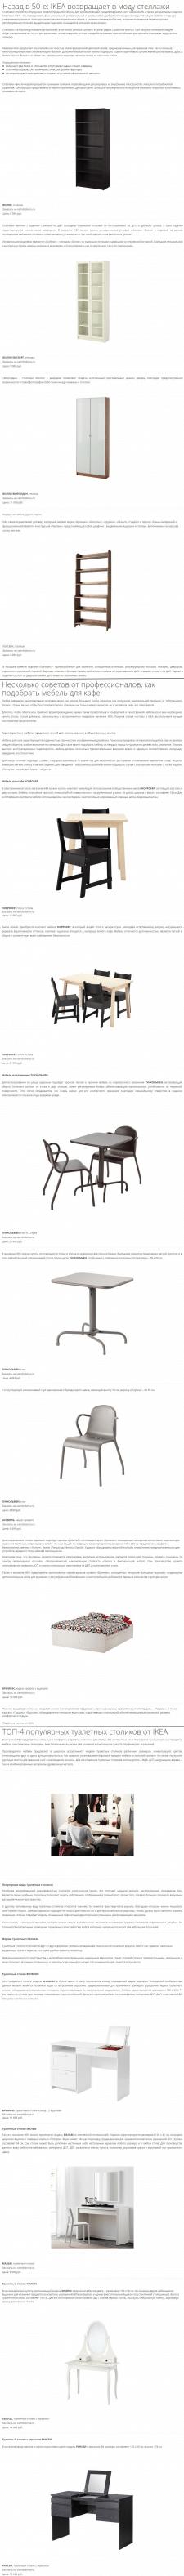 МЕБЕЛЬ | Мебель Ikea